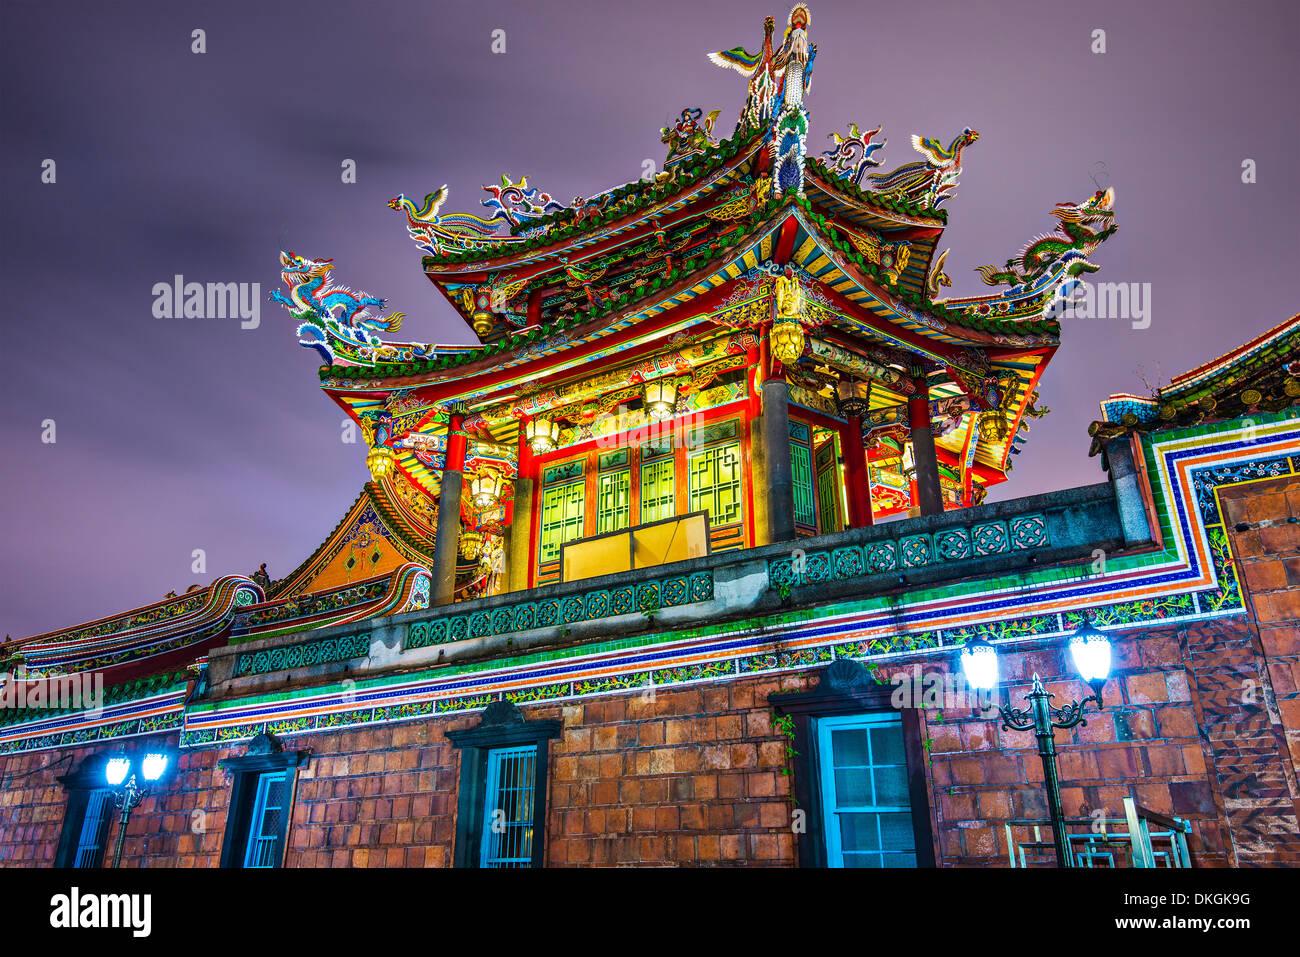 Detalle de la pared exterior del templo Longshan Taipei, Taiwán. Imagen De Stock